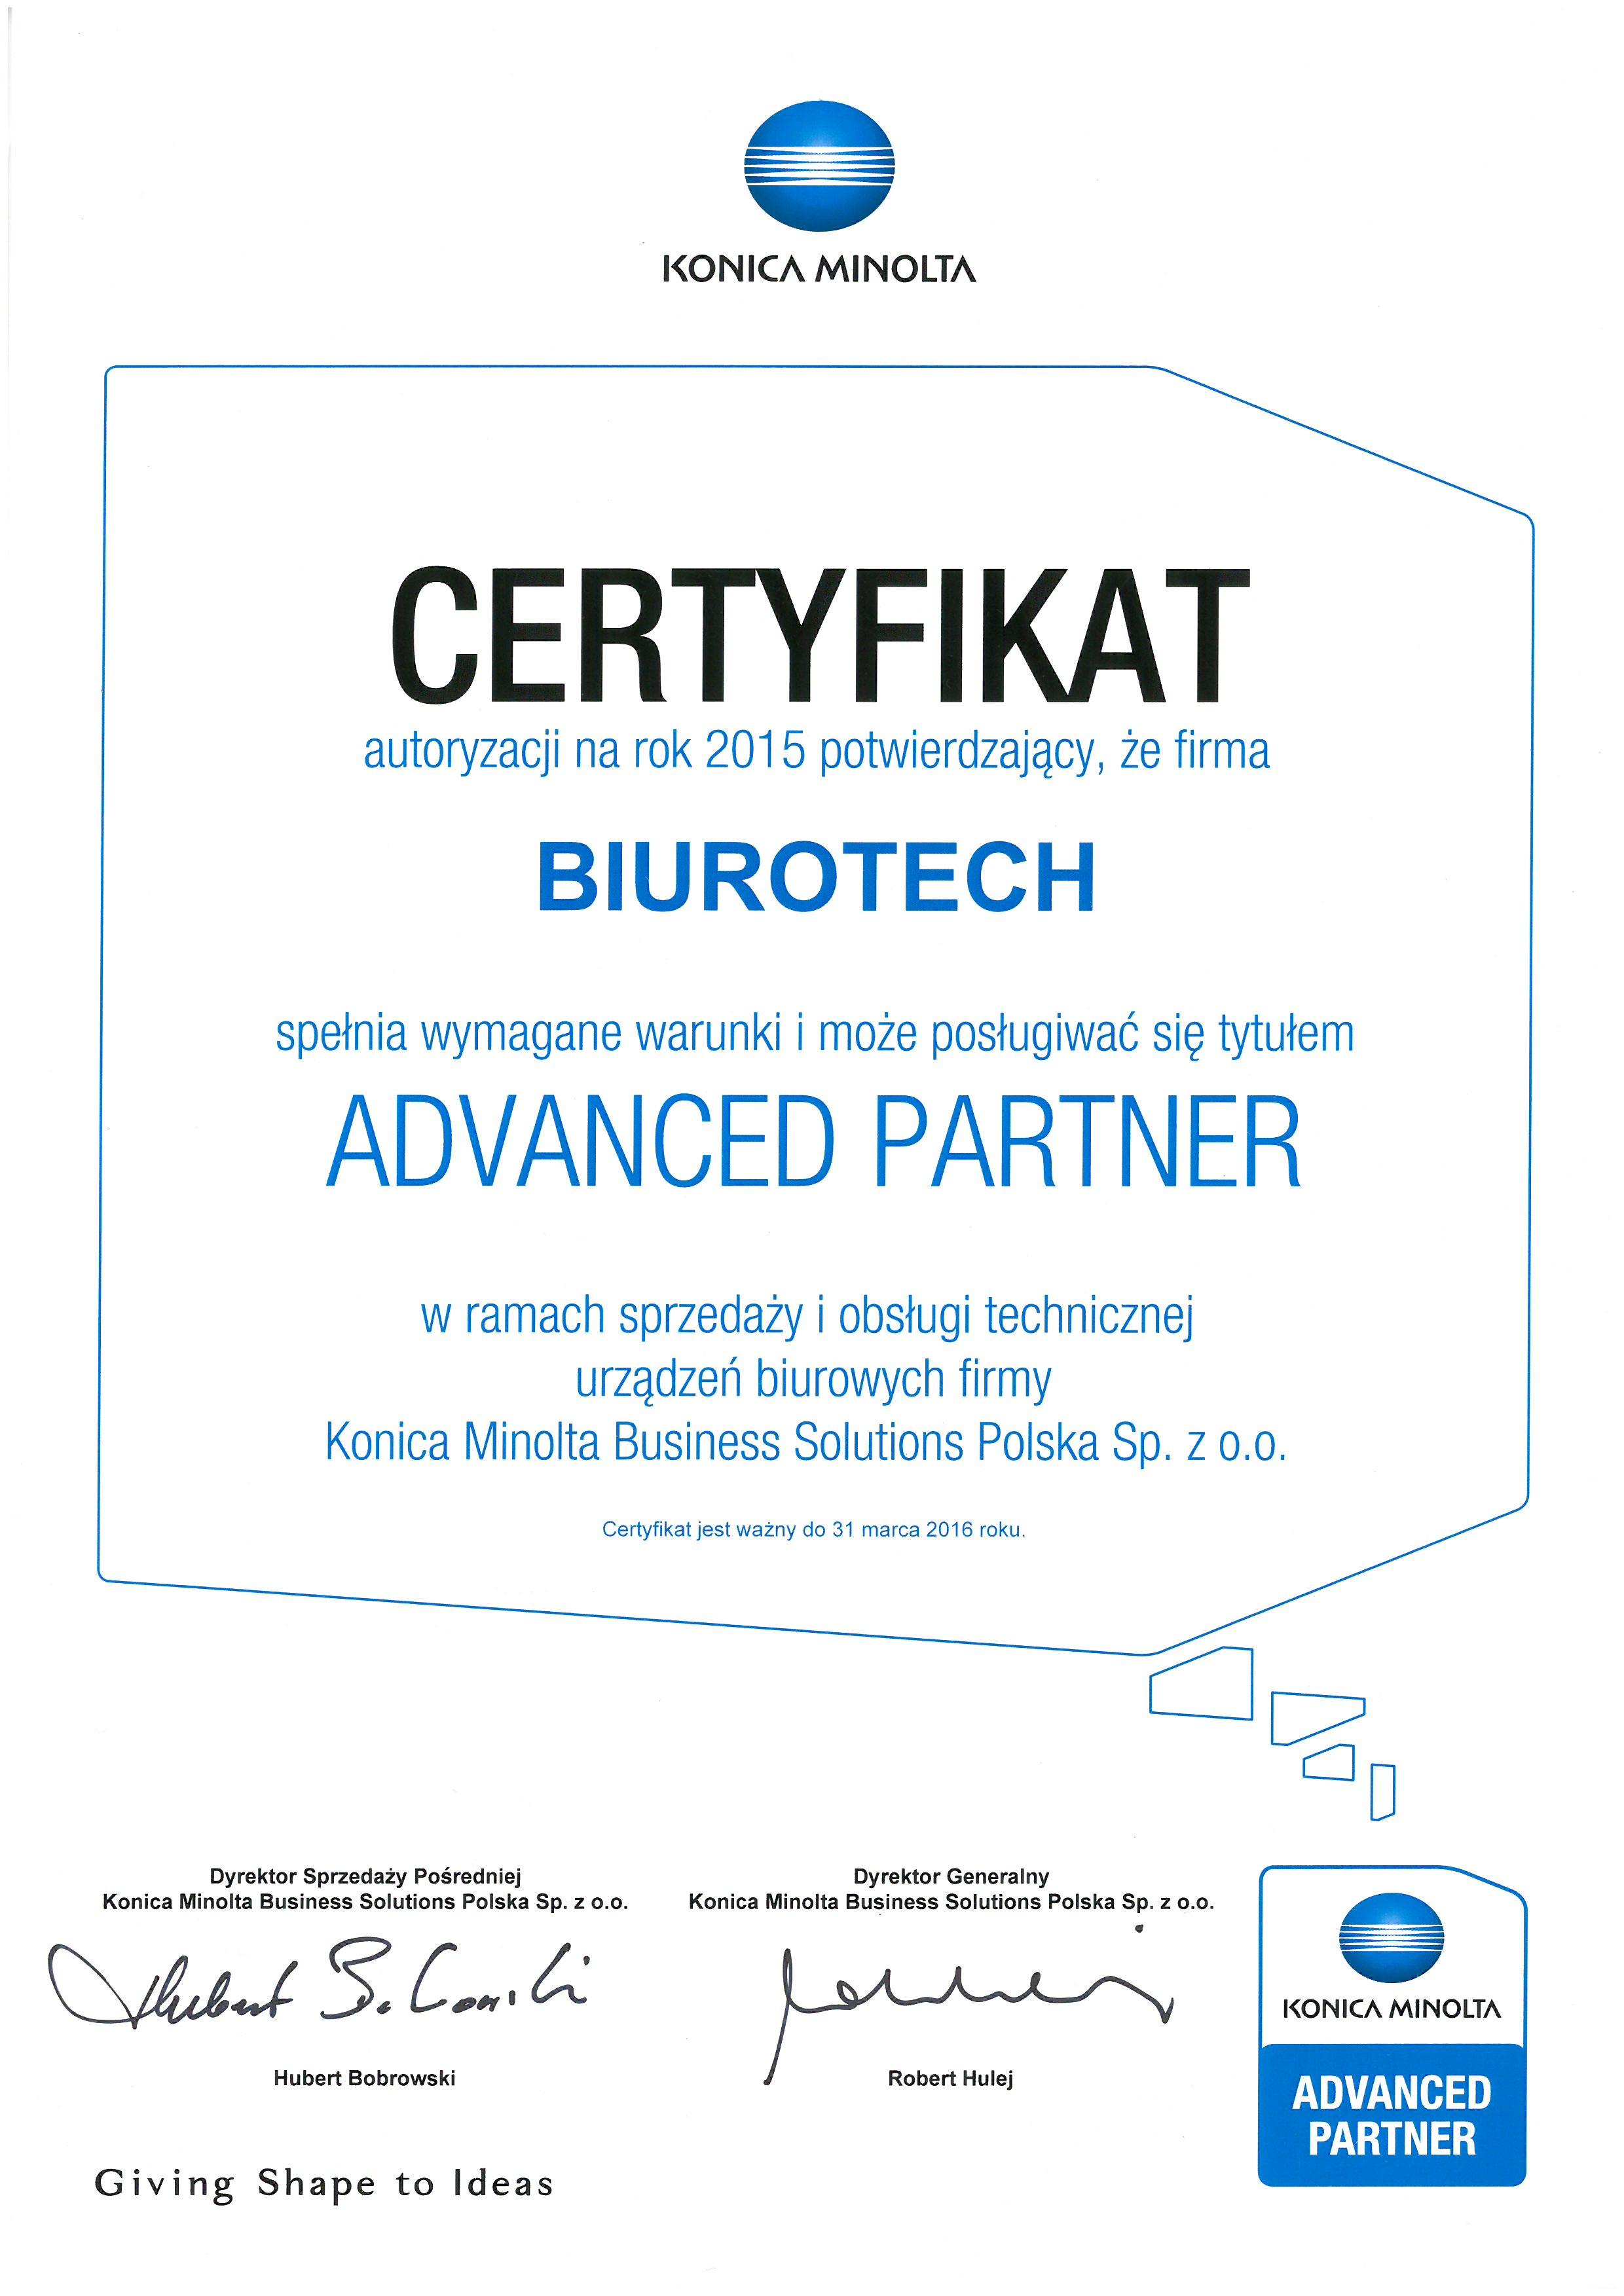 Biurotech - autoryzowany Advanced Partner Konica Minolta 2015